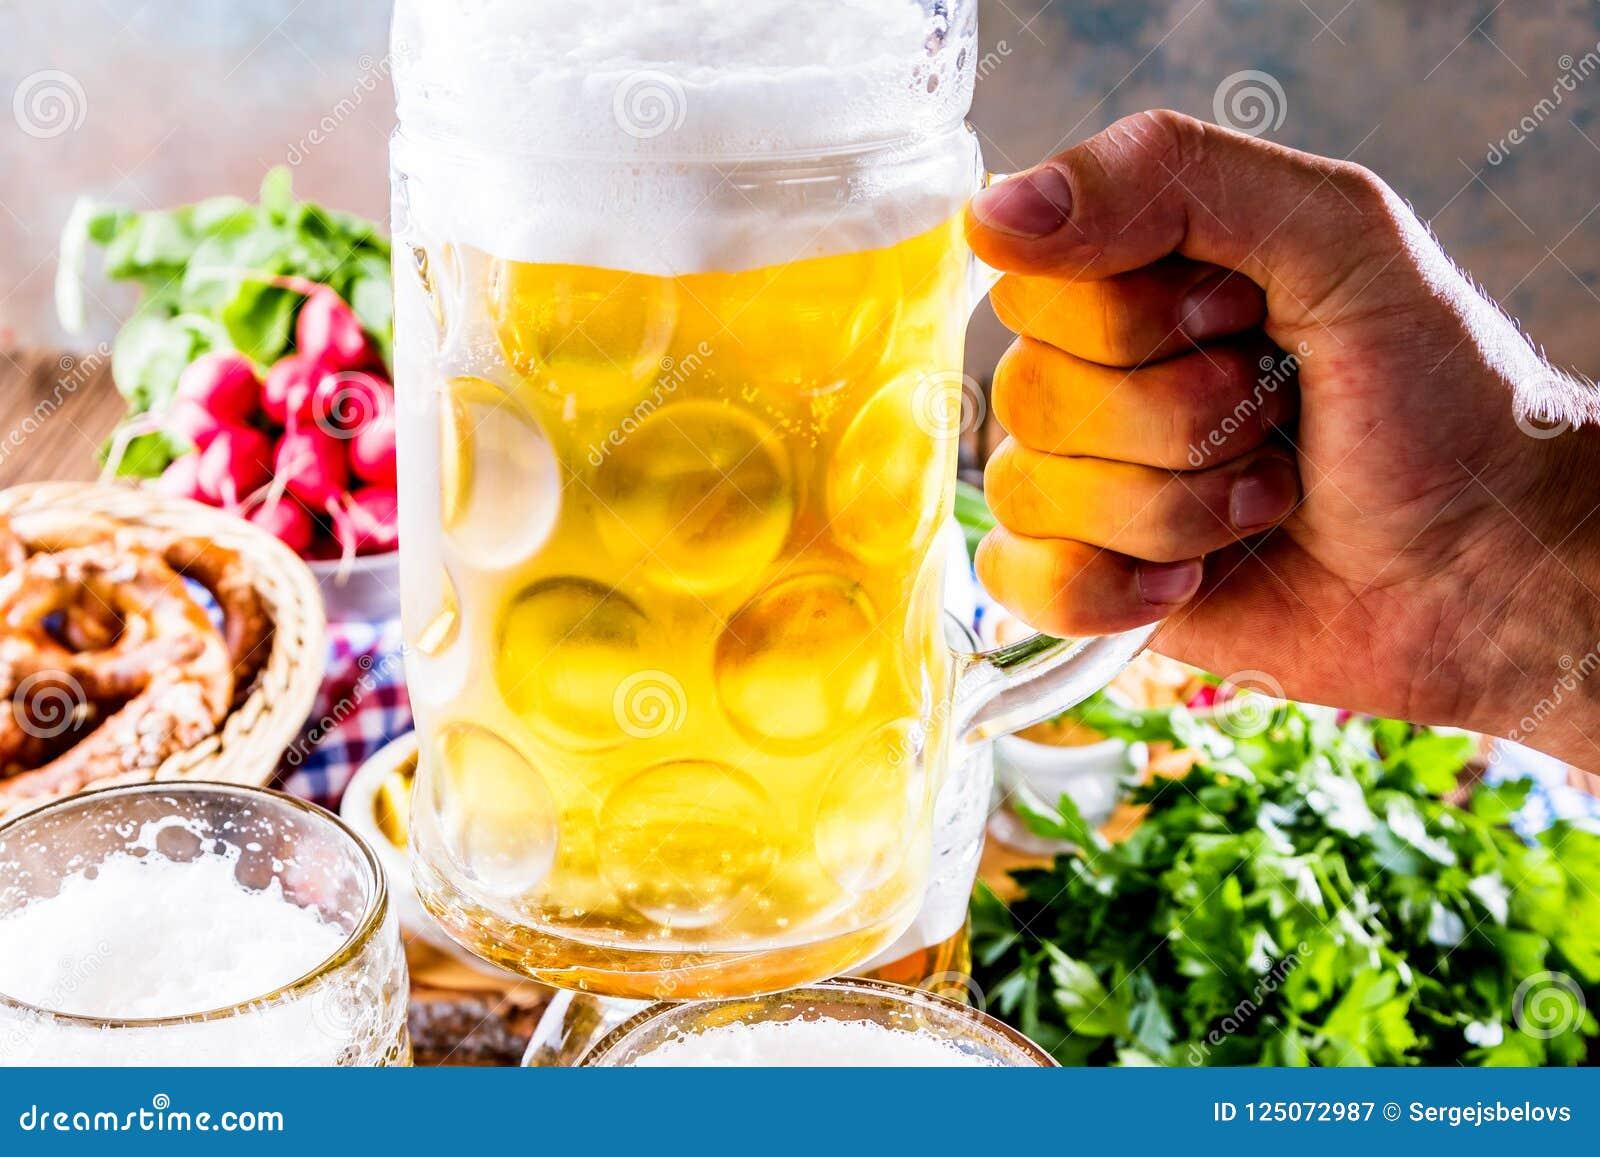 Menú de la comida de Oktoberfest, salchichas bávaras con los pretzeles, puré de patata, chucrut, cerveza